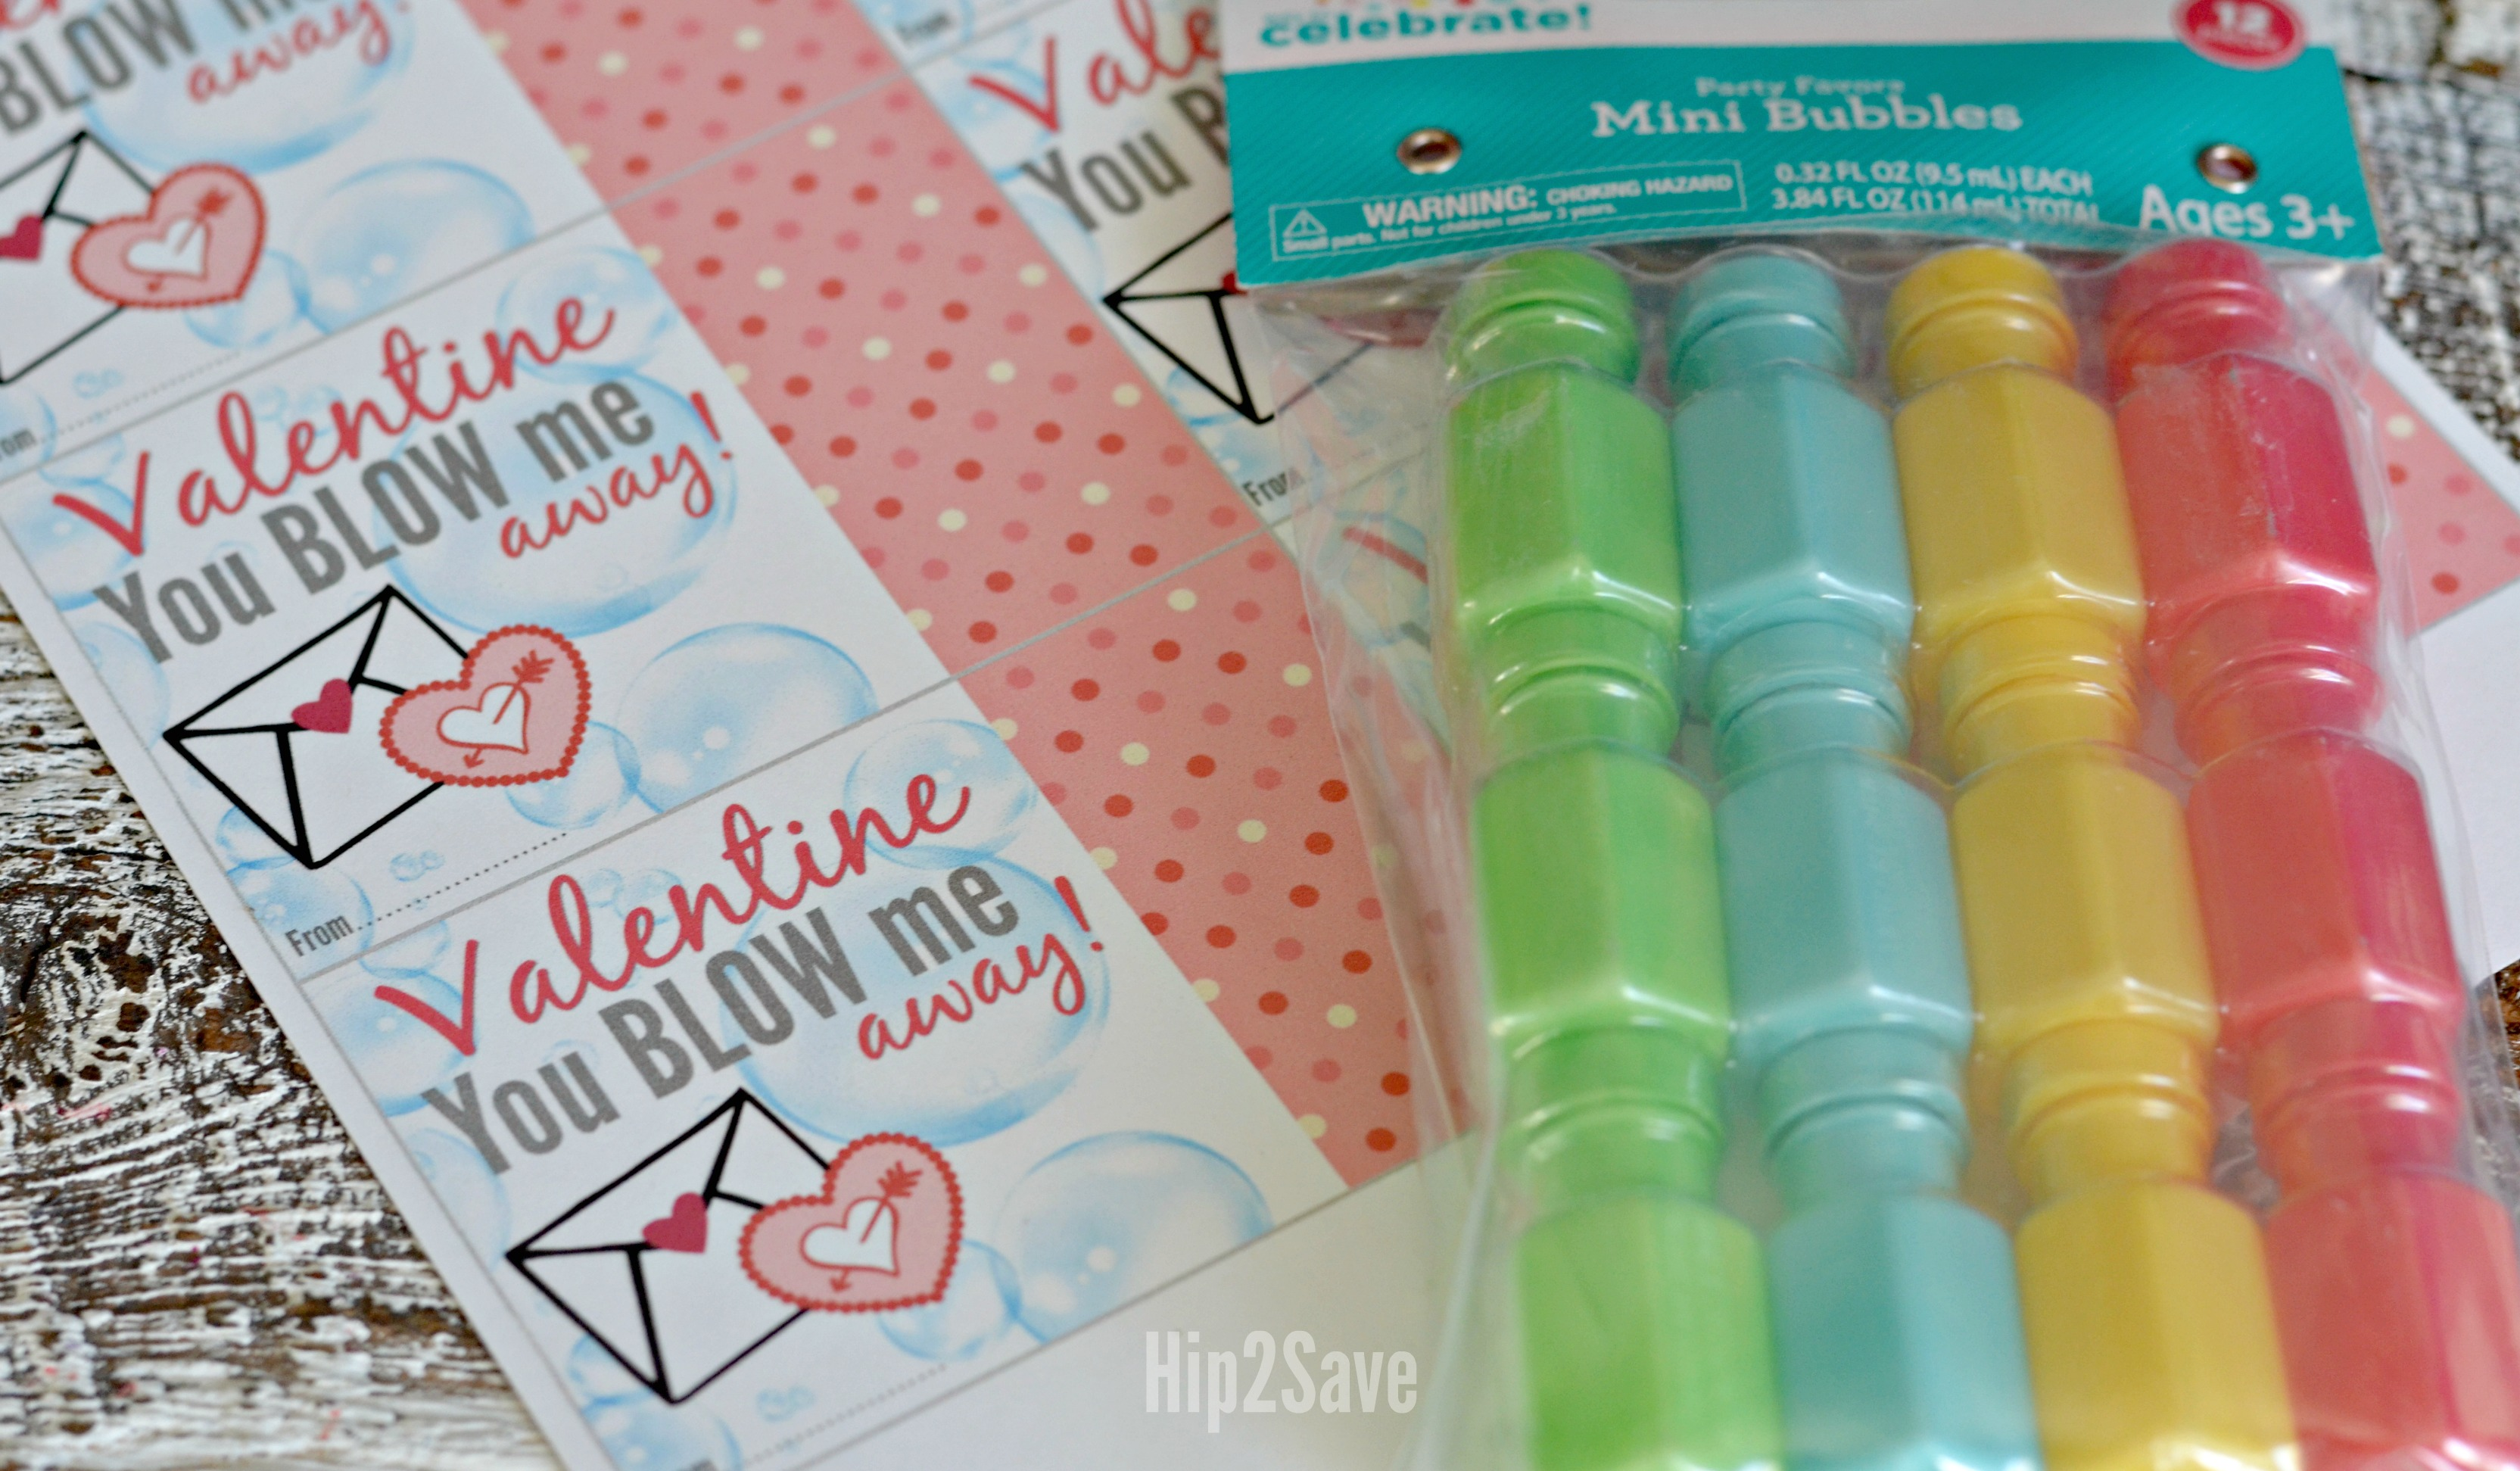 photograph regarding You Blow Me Away Valentine Printable identify Mini Bubbles \